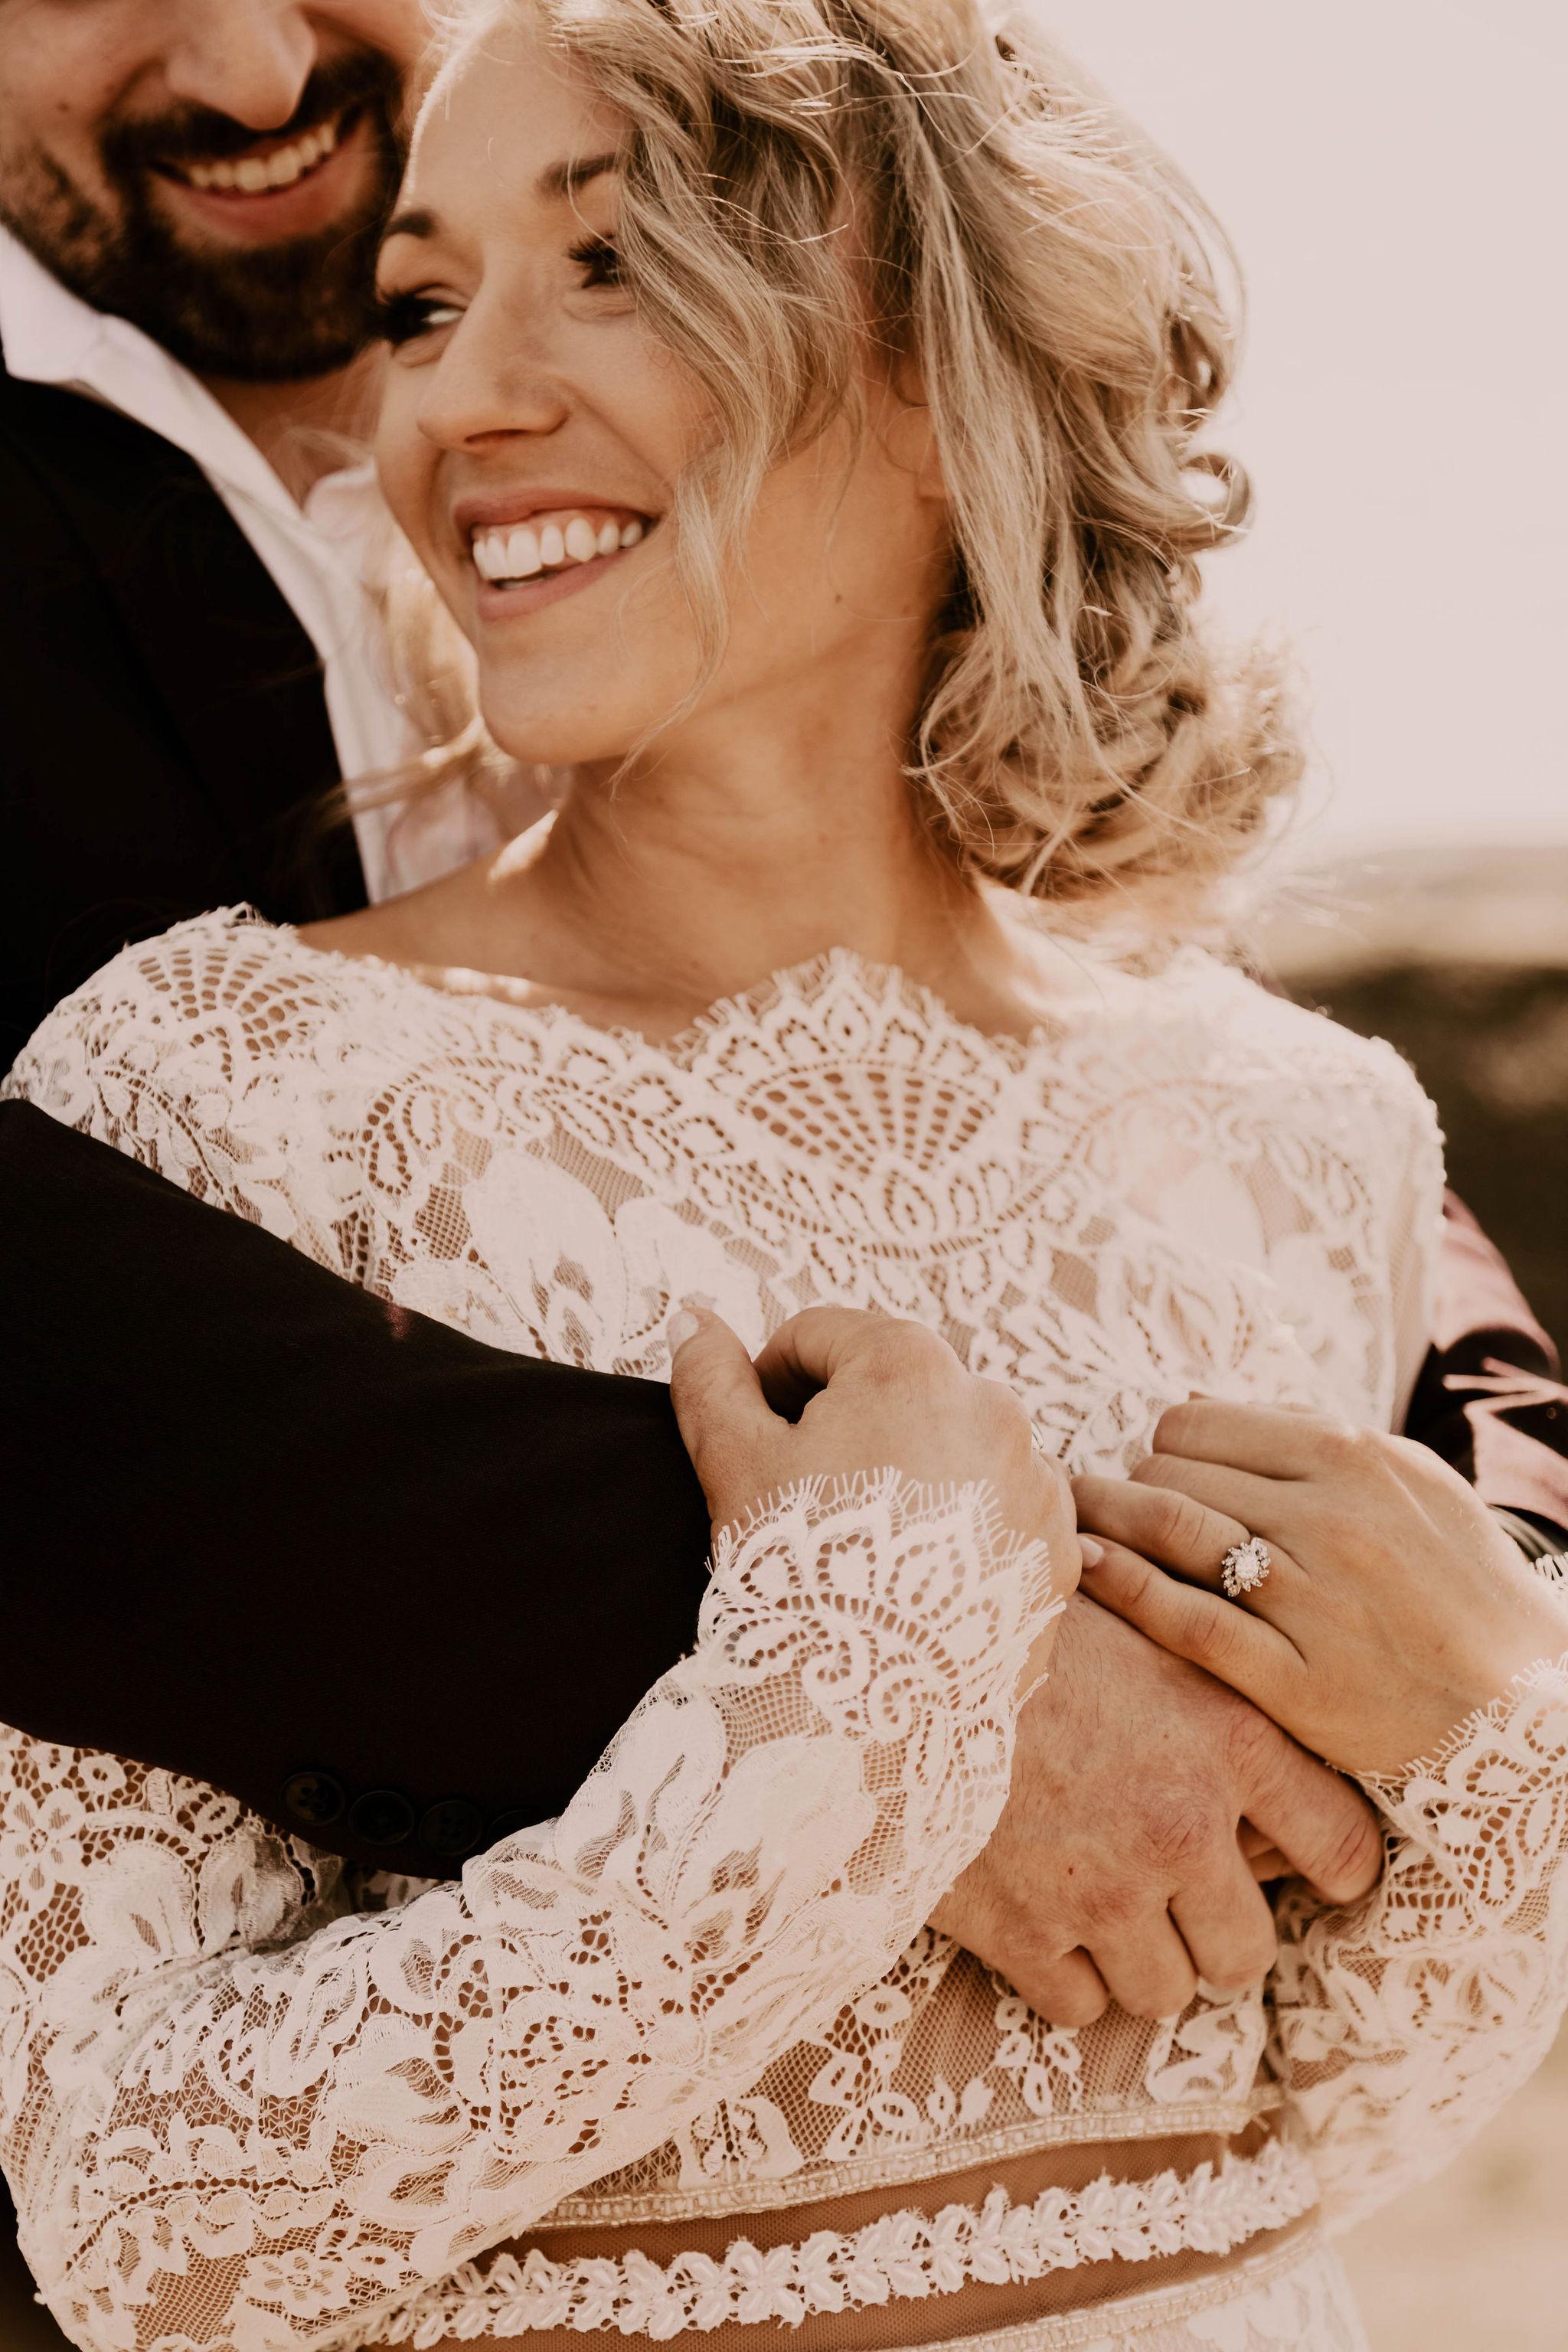 close up spokane couple wedding bride